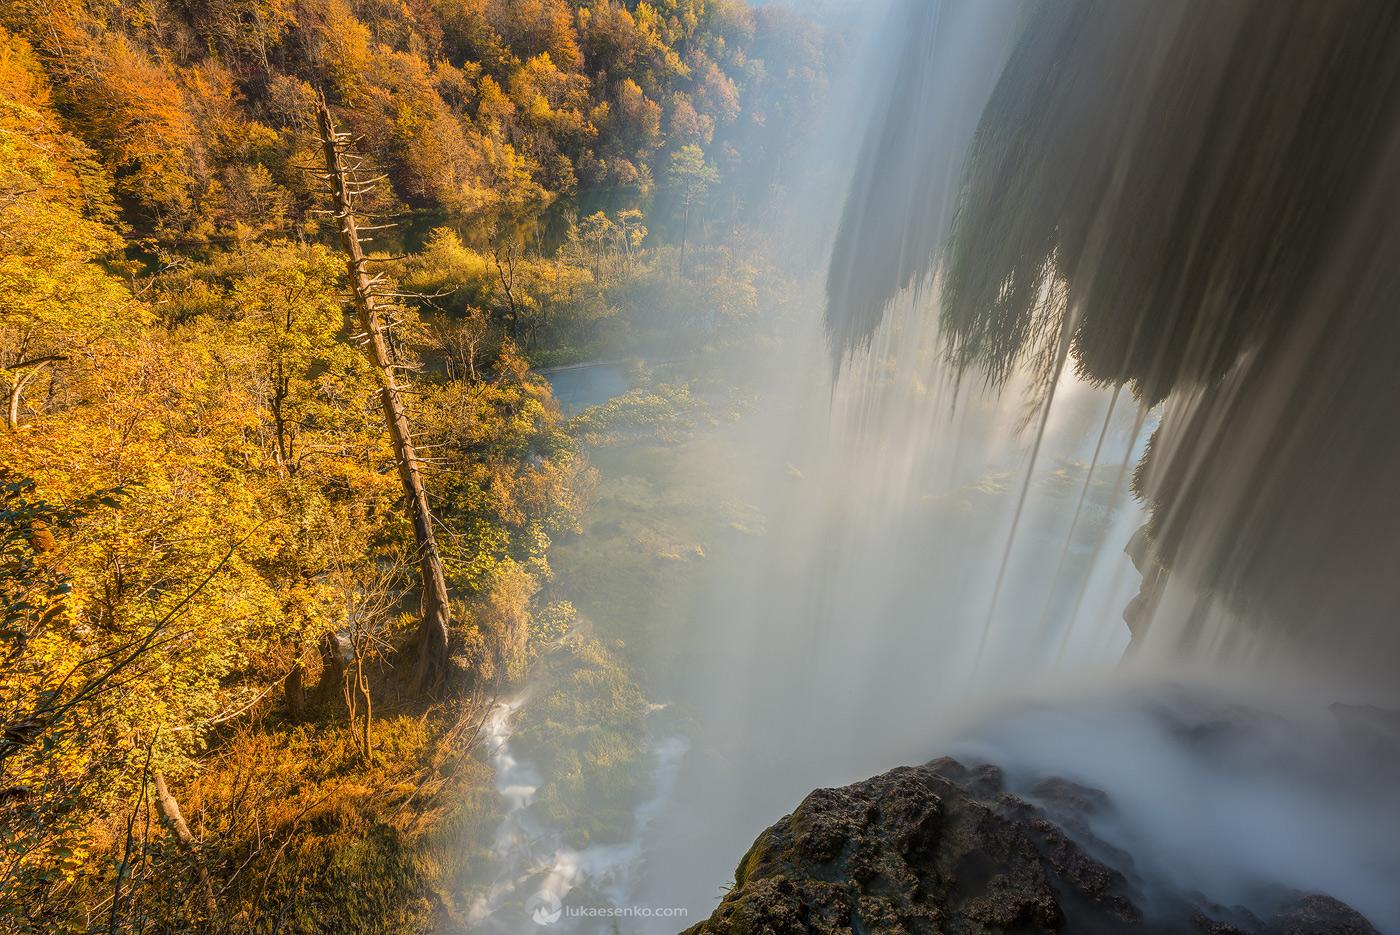 Autumn at Plitvice Lakes national park